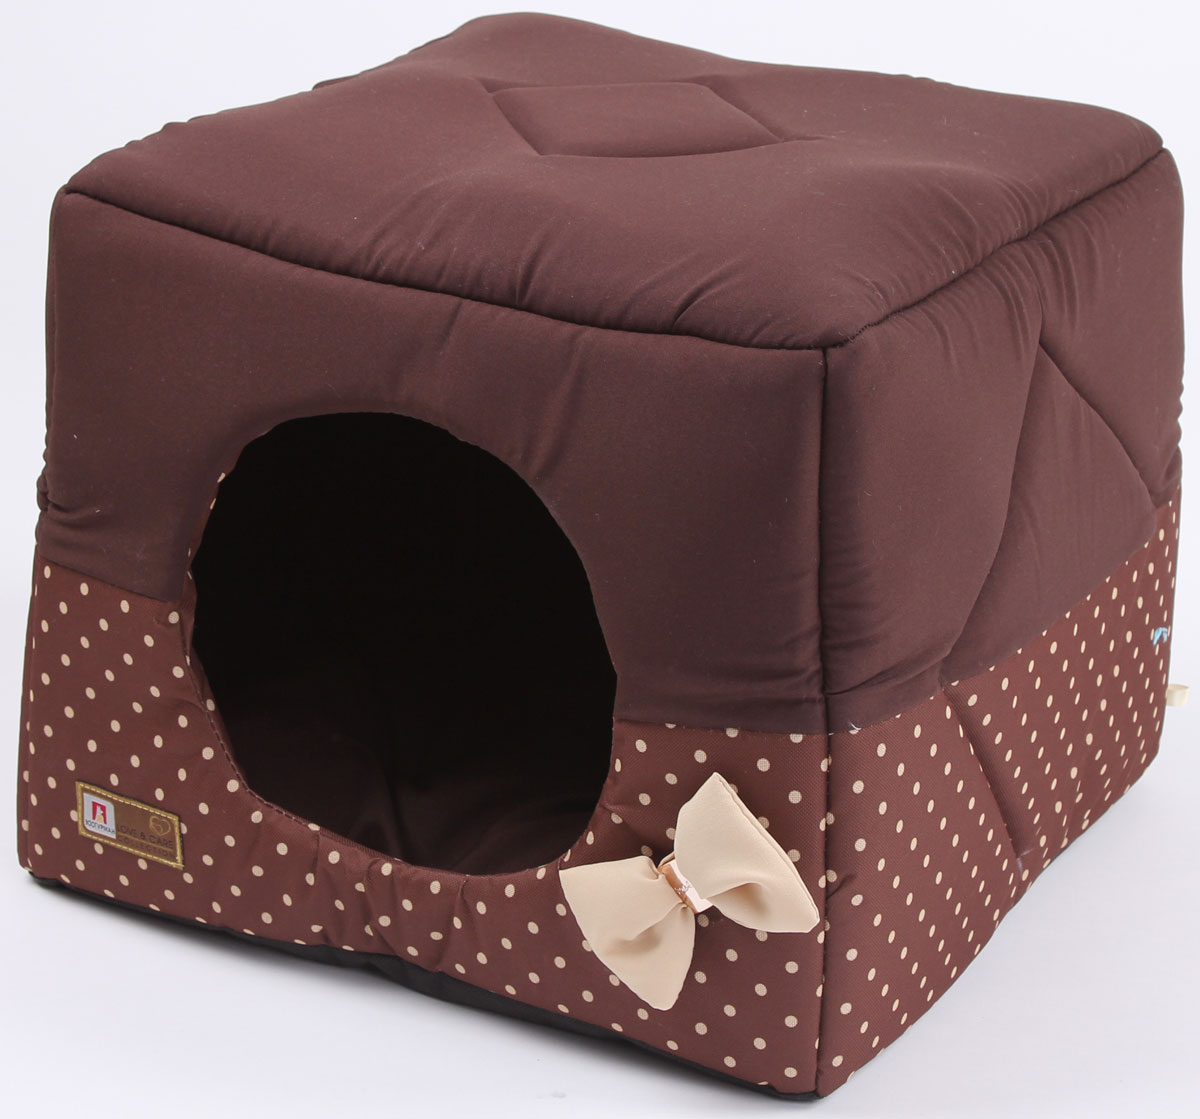 Лежак для собак и кошек Зоогурман Домосед, цвет: шоколадный, бежевый горох, 45 х 45 х 45 см лежак дарэлл хантер лось 2 с подушкой 55 40 16см